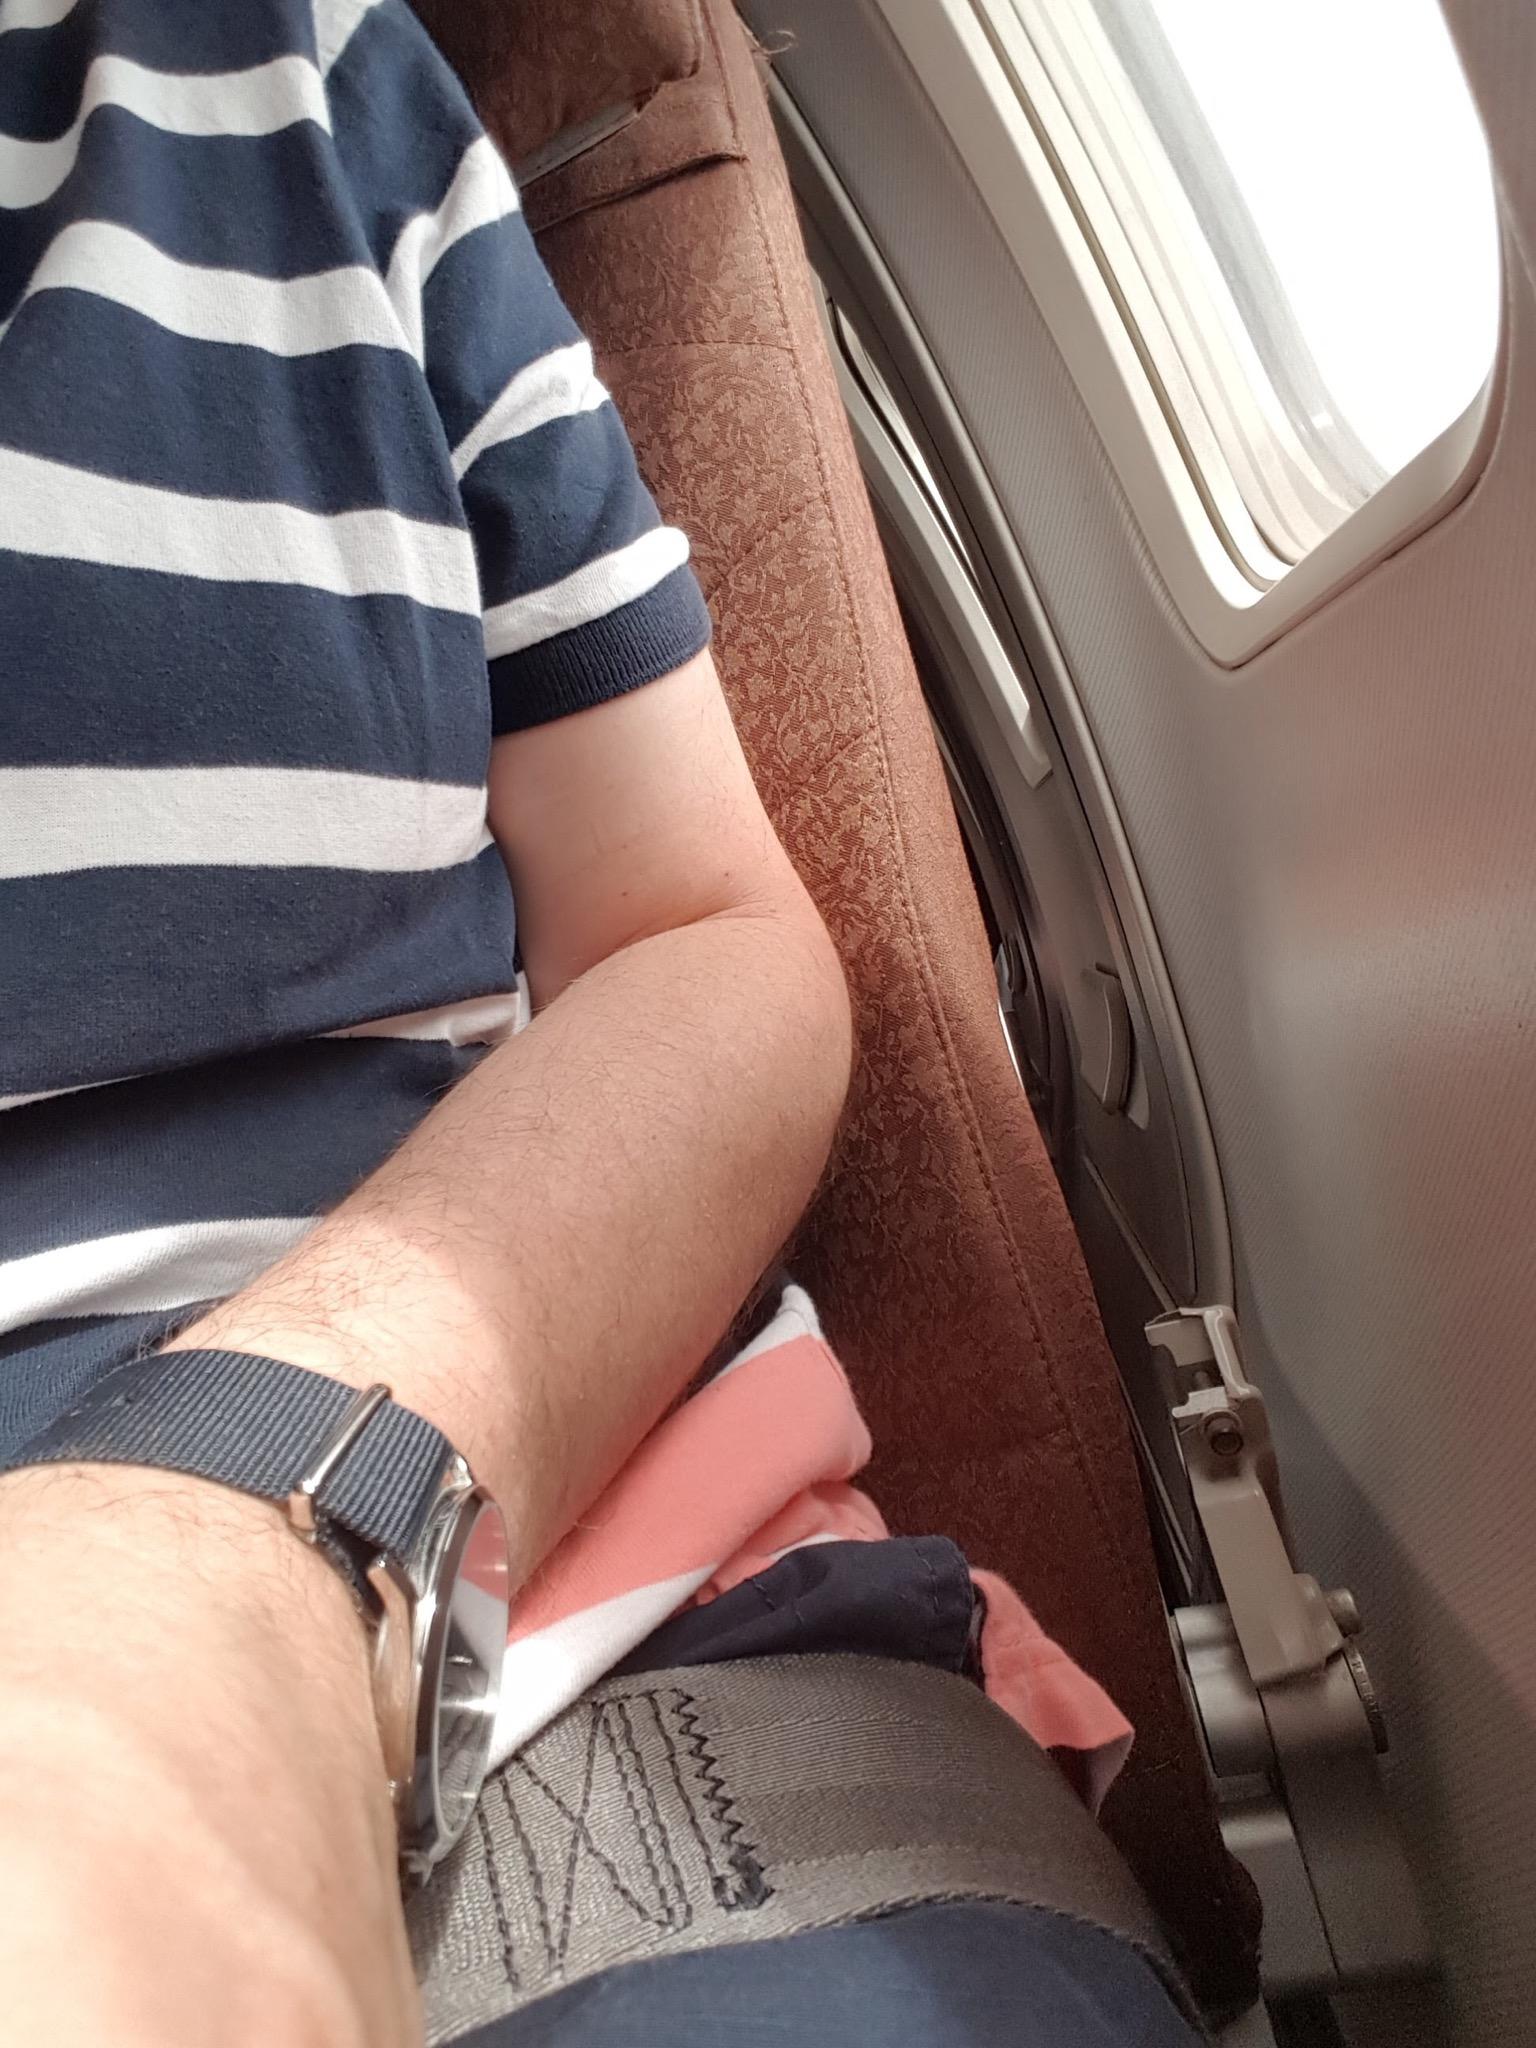 Garuda Indonesia Customer Reviews | SKYTRAX